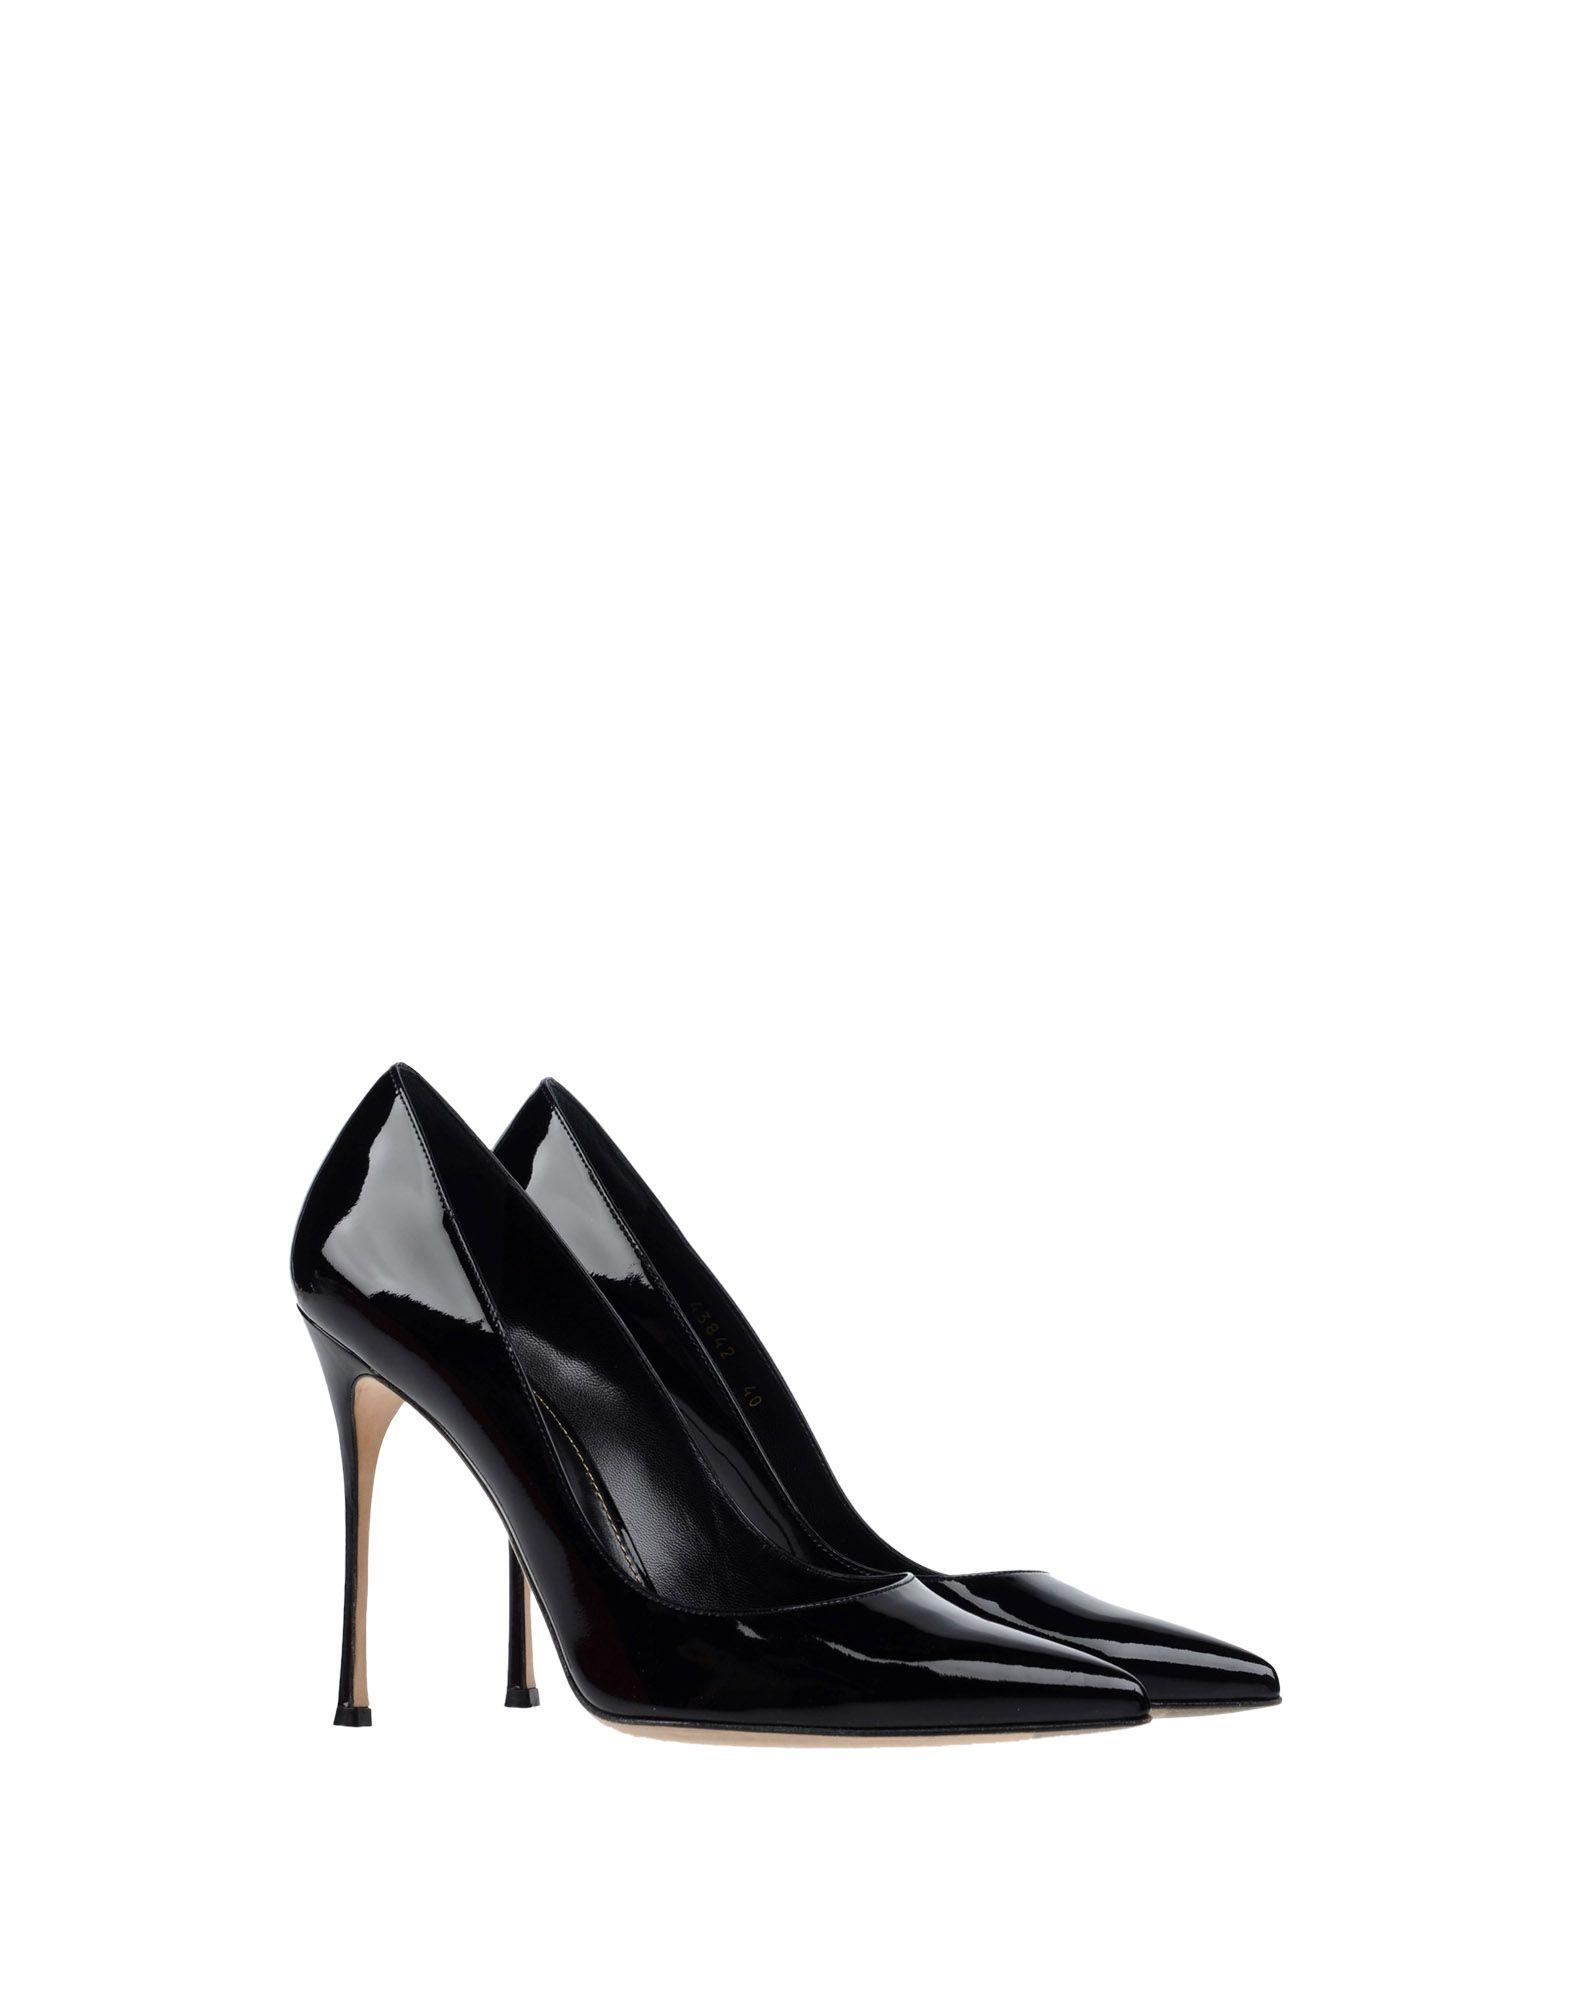 Sergio Rossi Pumps aussehende Damen  11279276AEGünstige gut aussehende Pumps Schuhe 1e86da